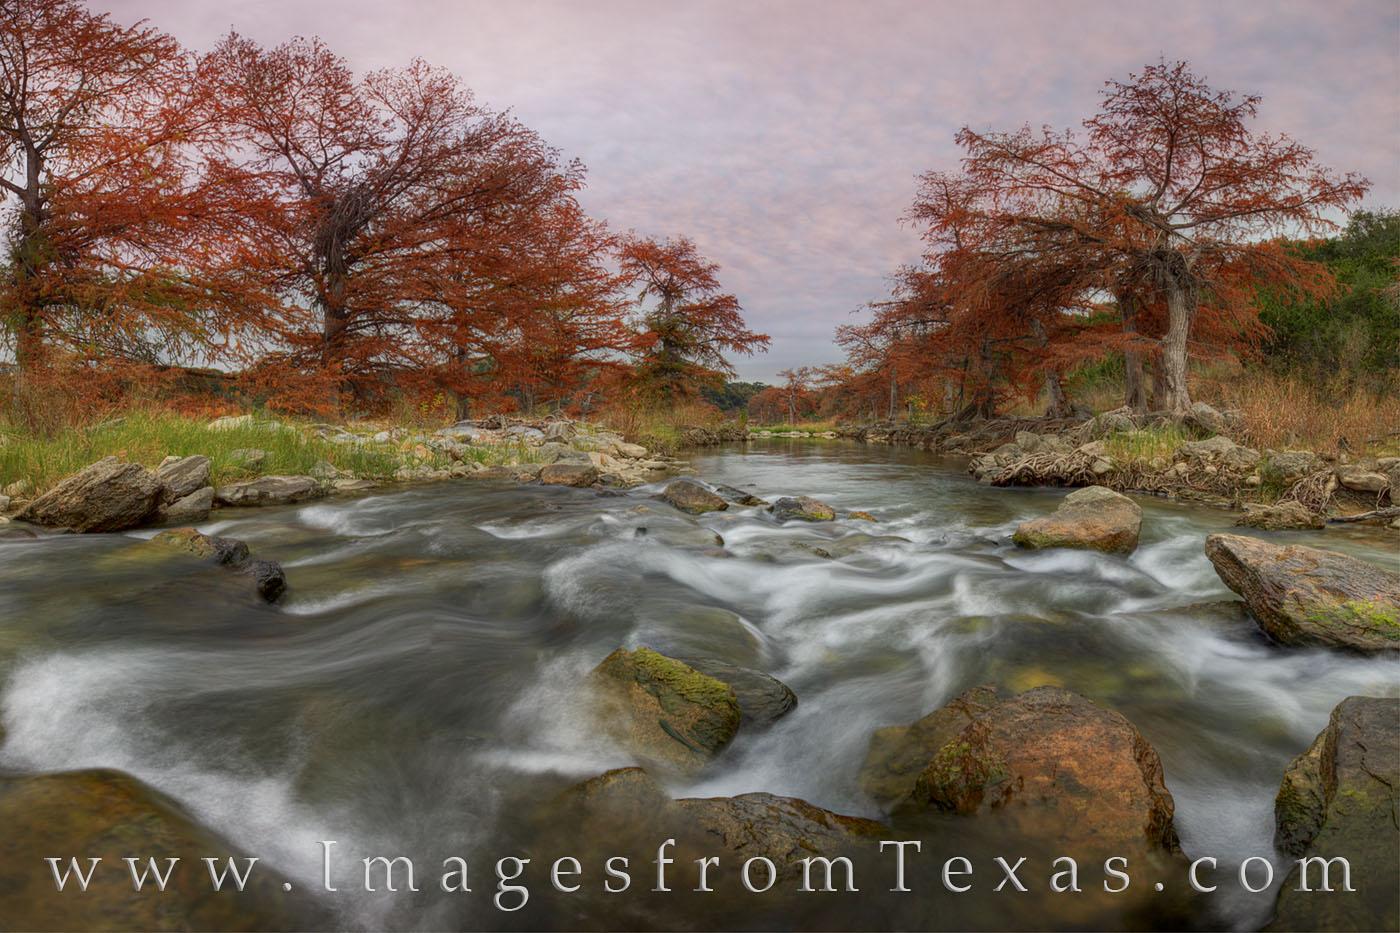 autumn colors, fal colors, cypress, pedernales river, texas state parks, pedernales falls, texas fall colors, texas colors, photo